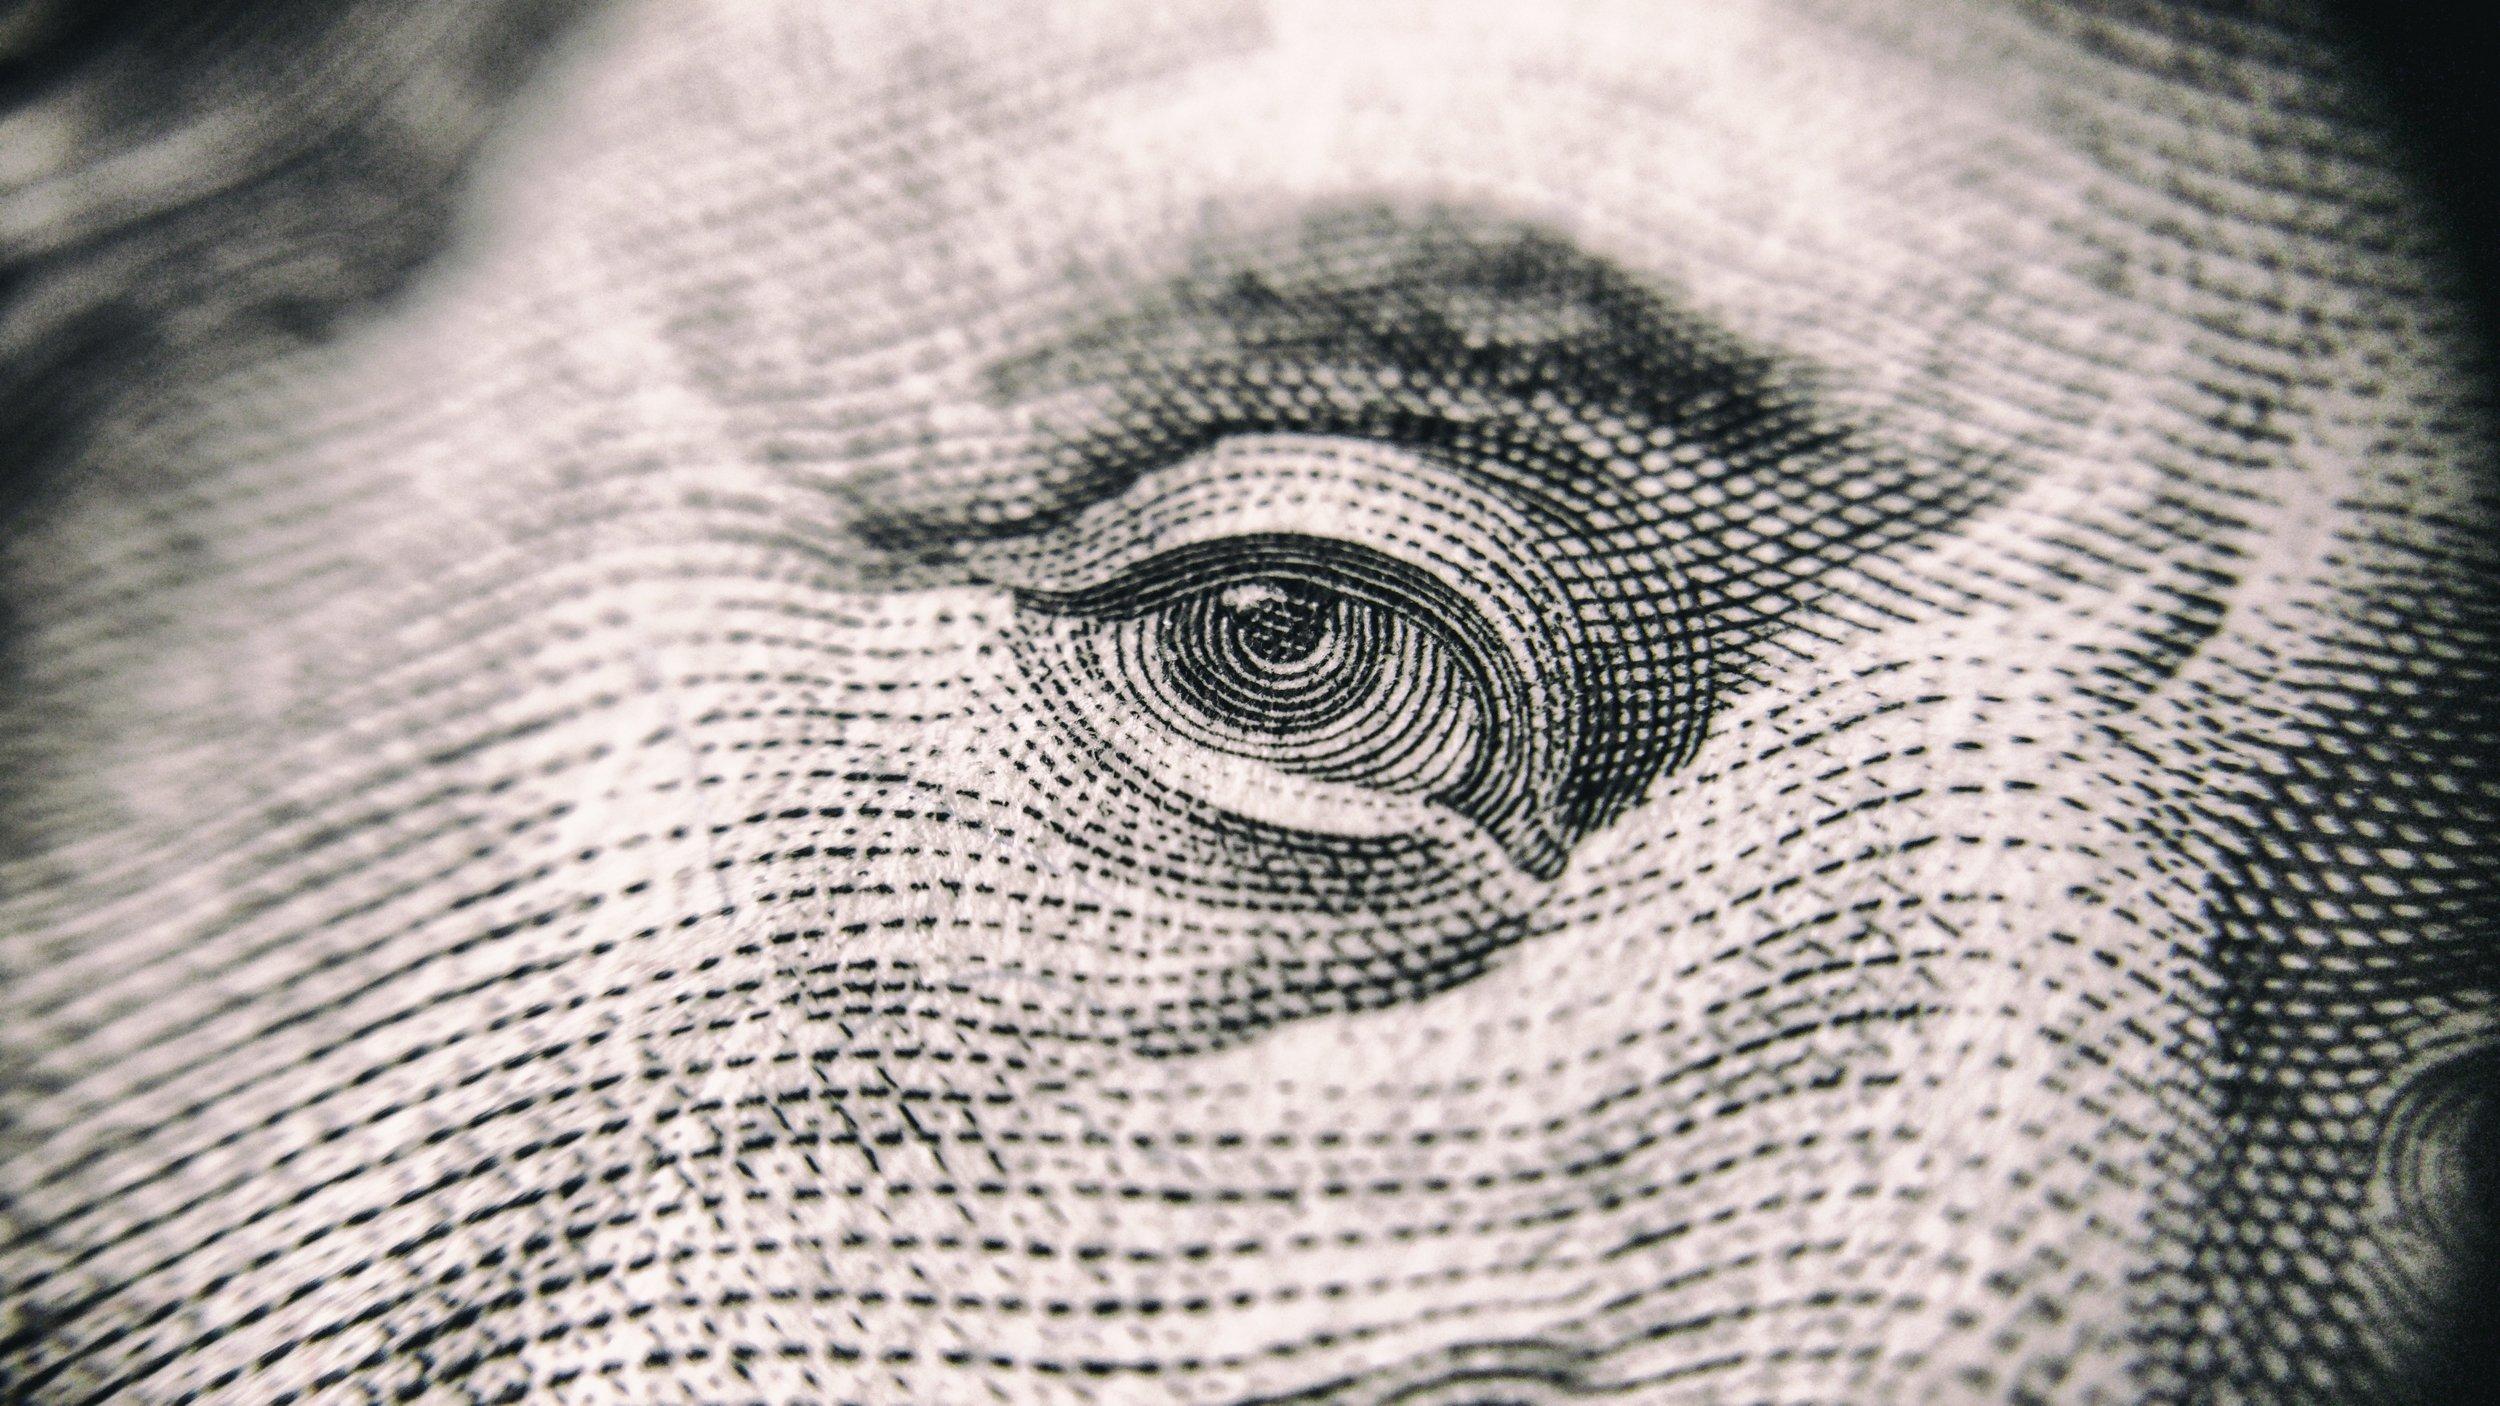 moneyclose up.jpg